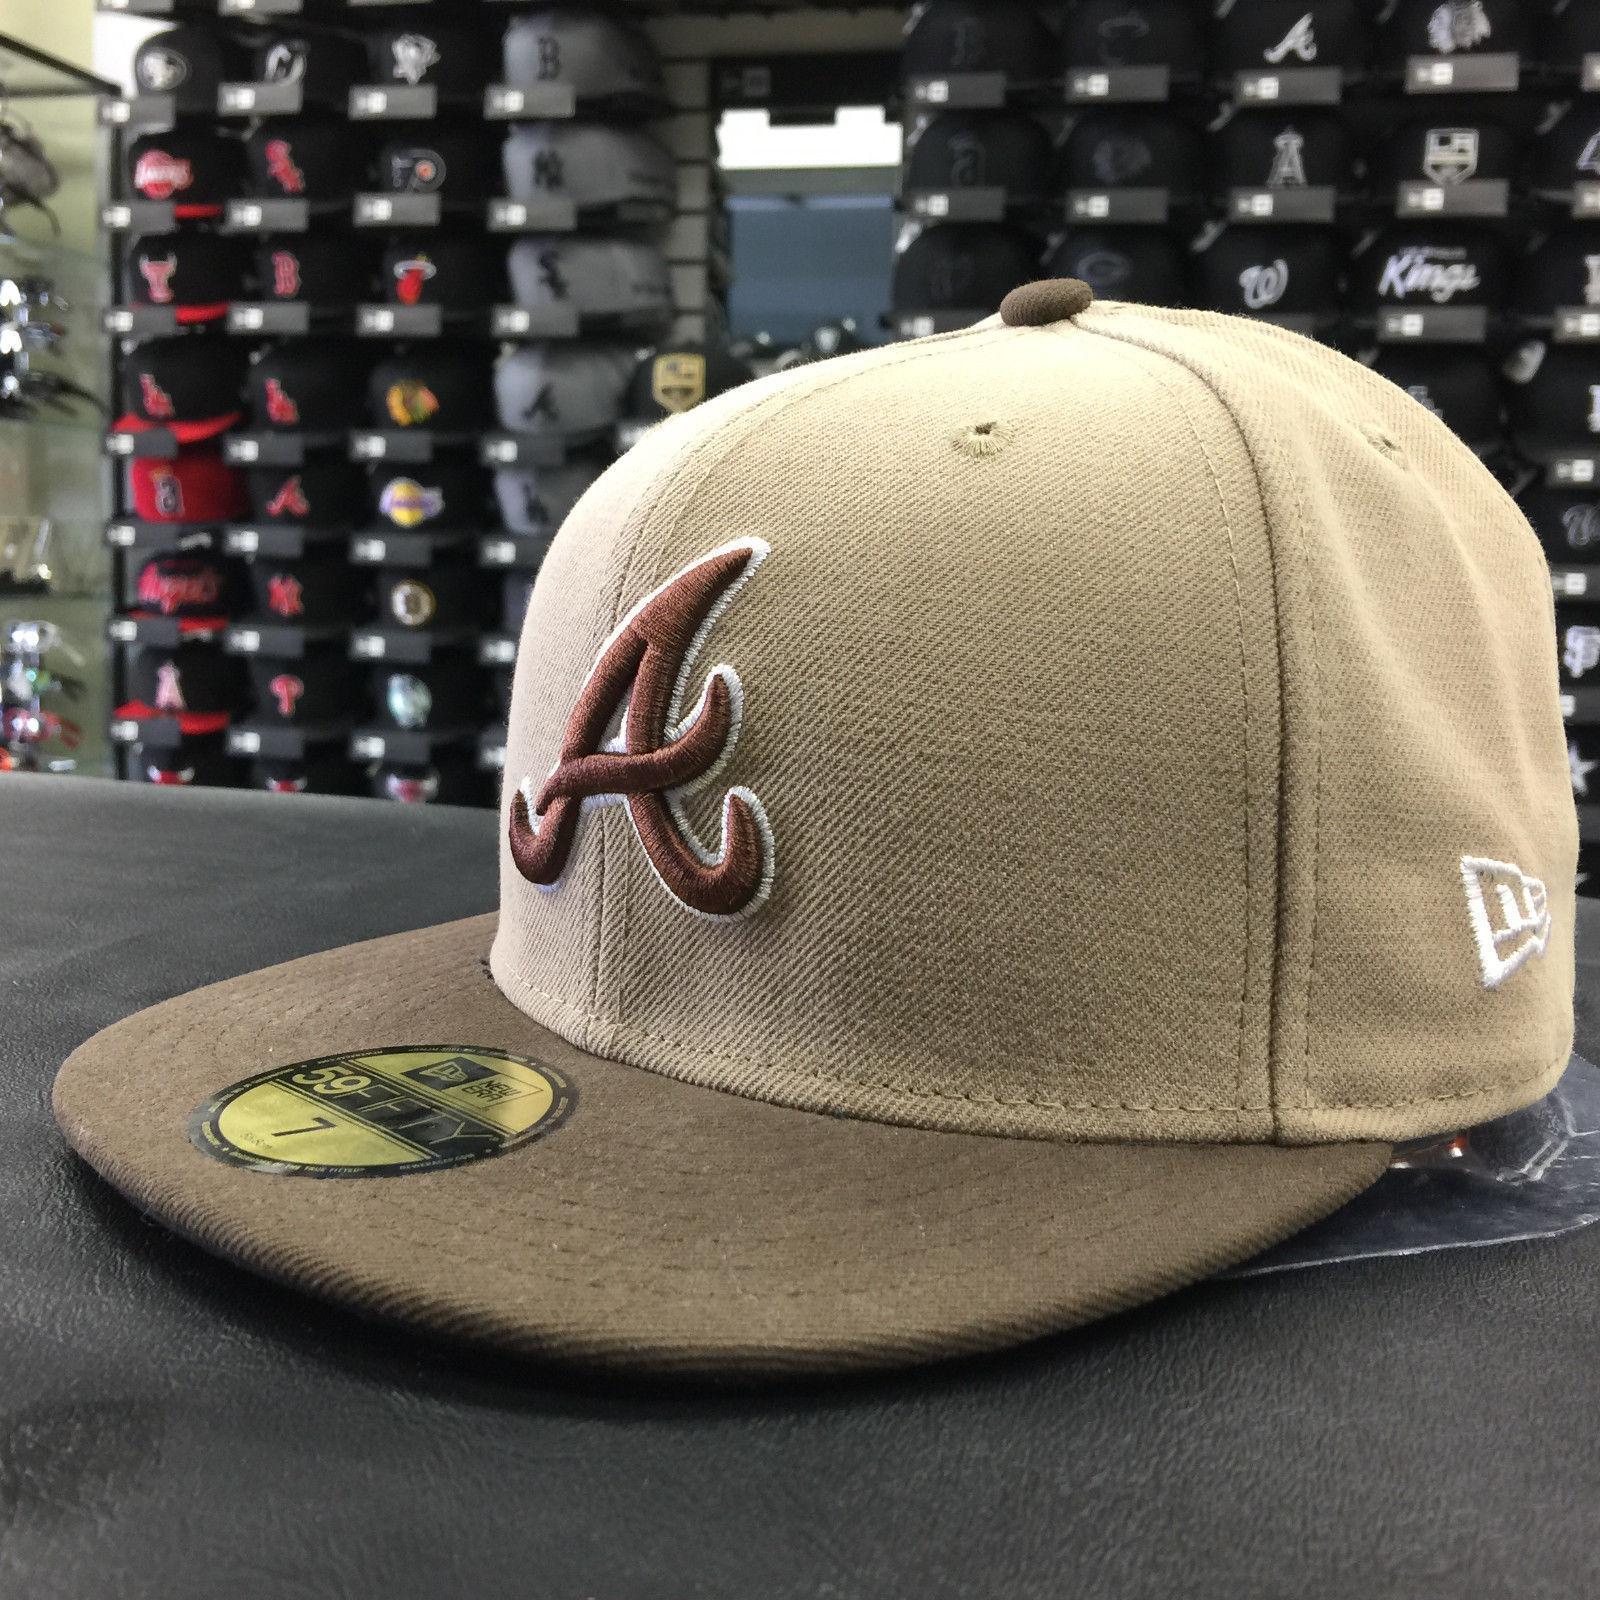 New Era 59Fifty MLB Atlanta Braves Walnut Fitted Cap